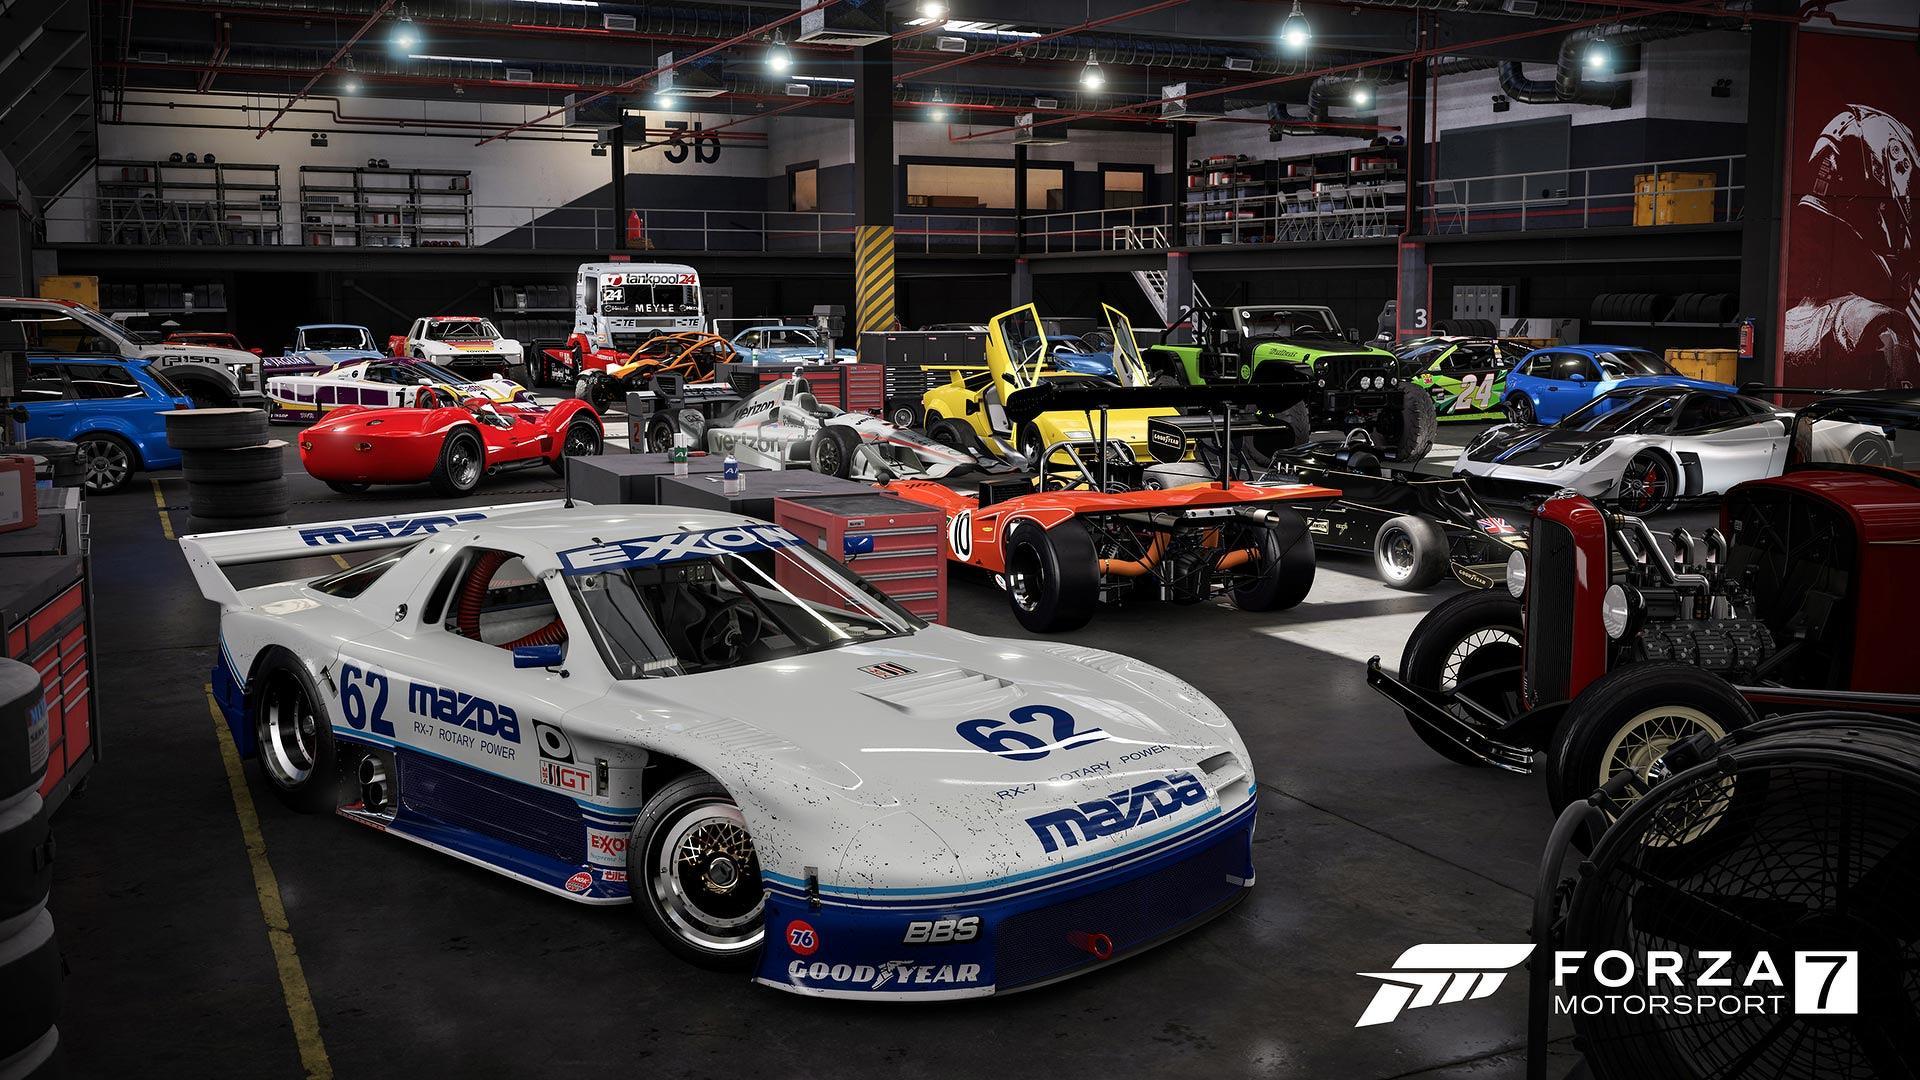 Forza motorsport 7 launch trailer reveals virtual driving paradise